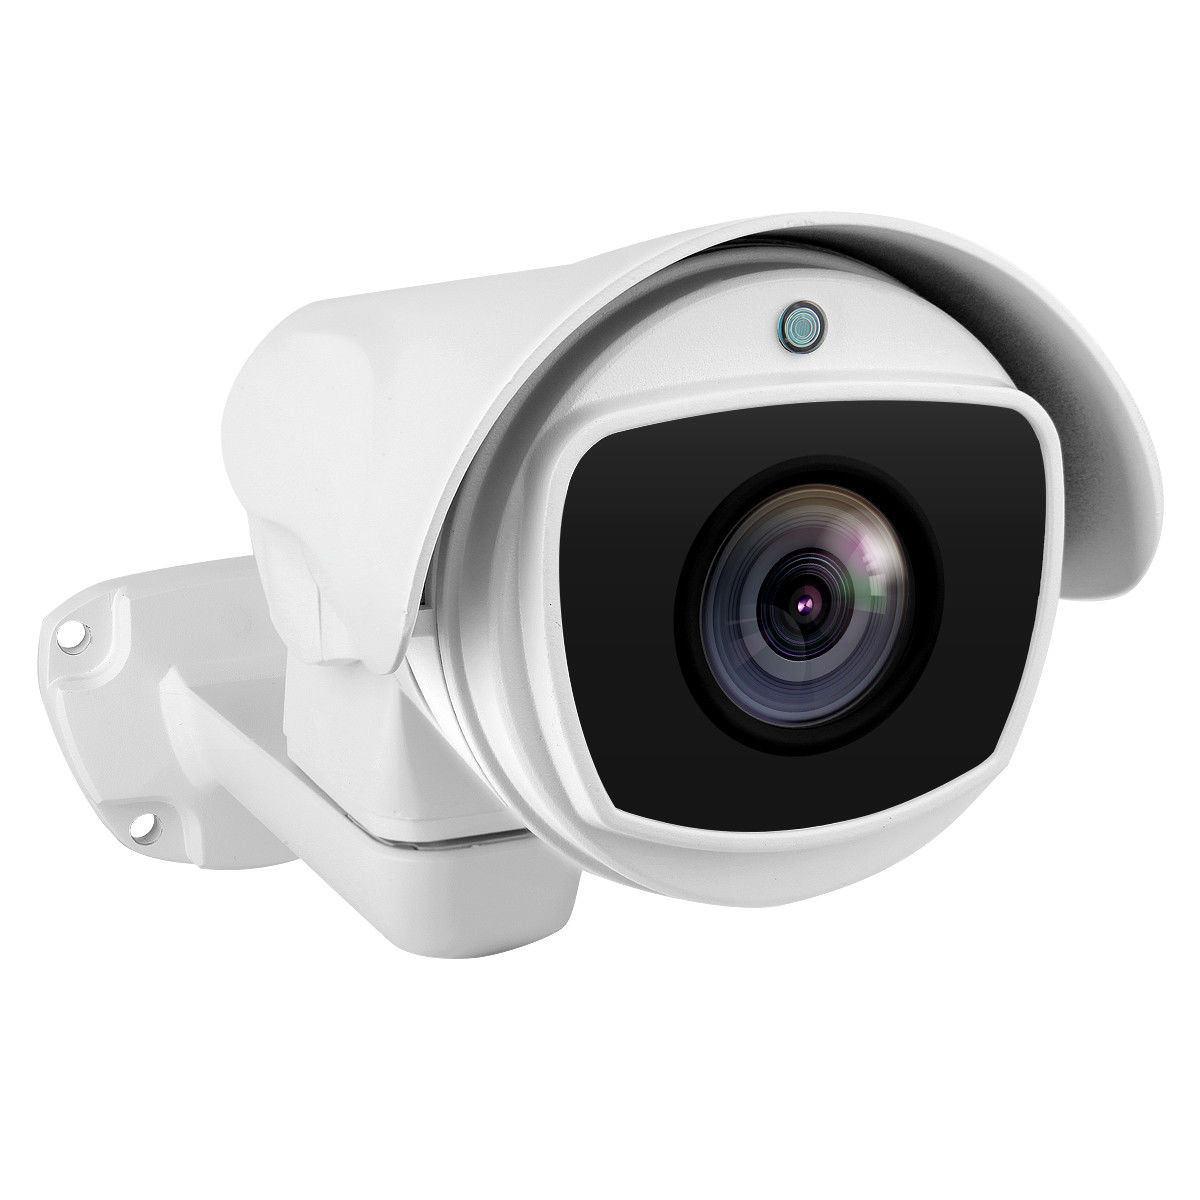 10X Optical ZOOM HD 1080P 1/3 CMOS 2.0MP Mini Bullet PTZ Security CCTV IR H.264 POE IP Camera IP66 Outdoor Audio h3 p1d3 h 264wireless 400kp cmos dome zoom lens ip camera w ir 10x optical zoom white